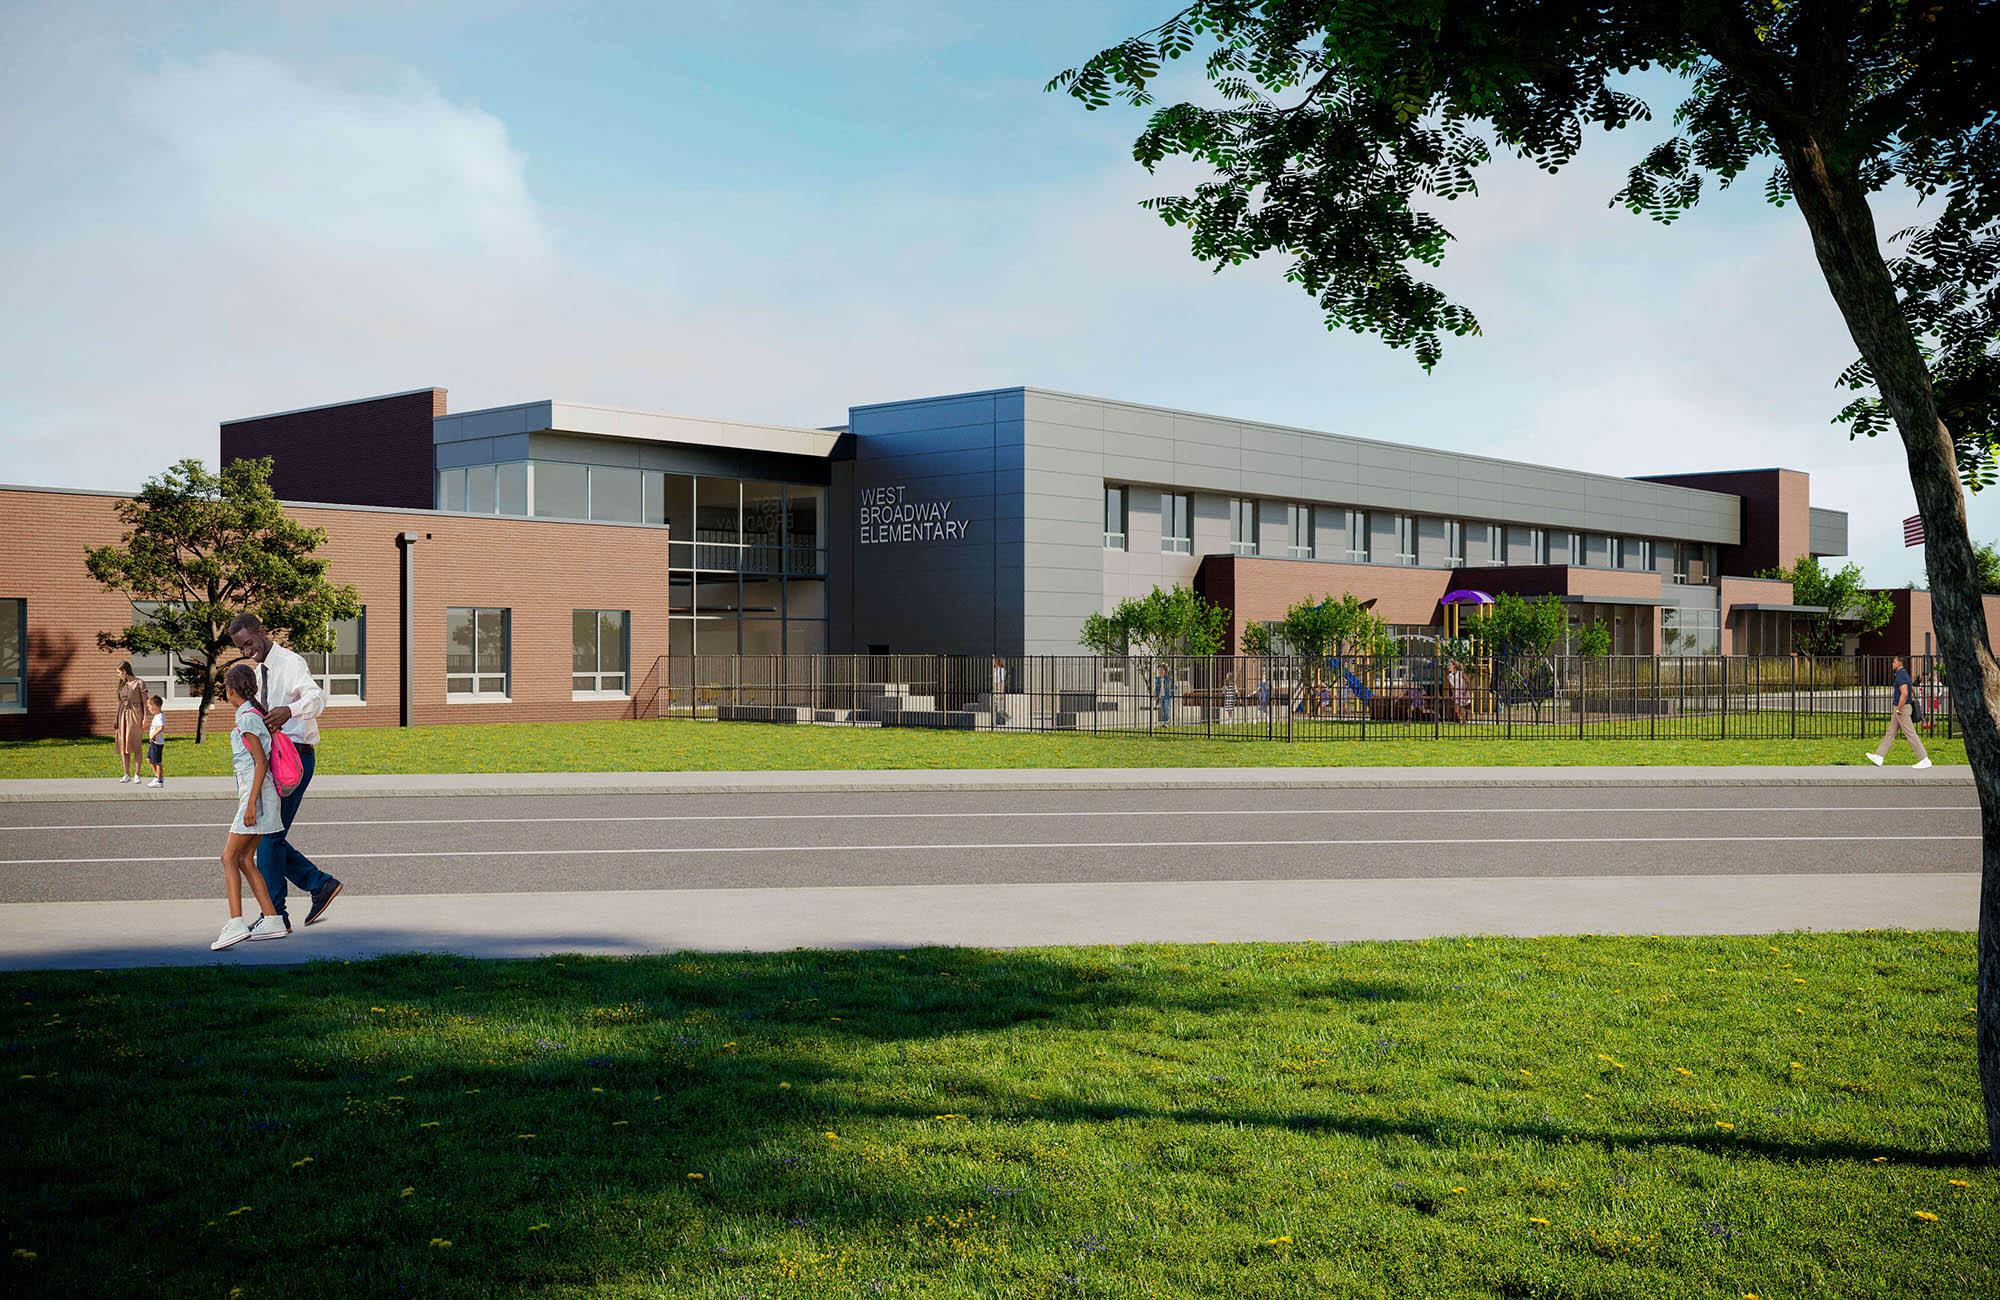 JCPS-WestBroadwayElementarySchool-entrance